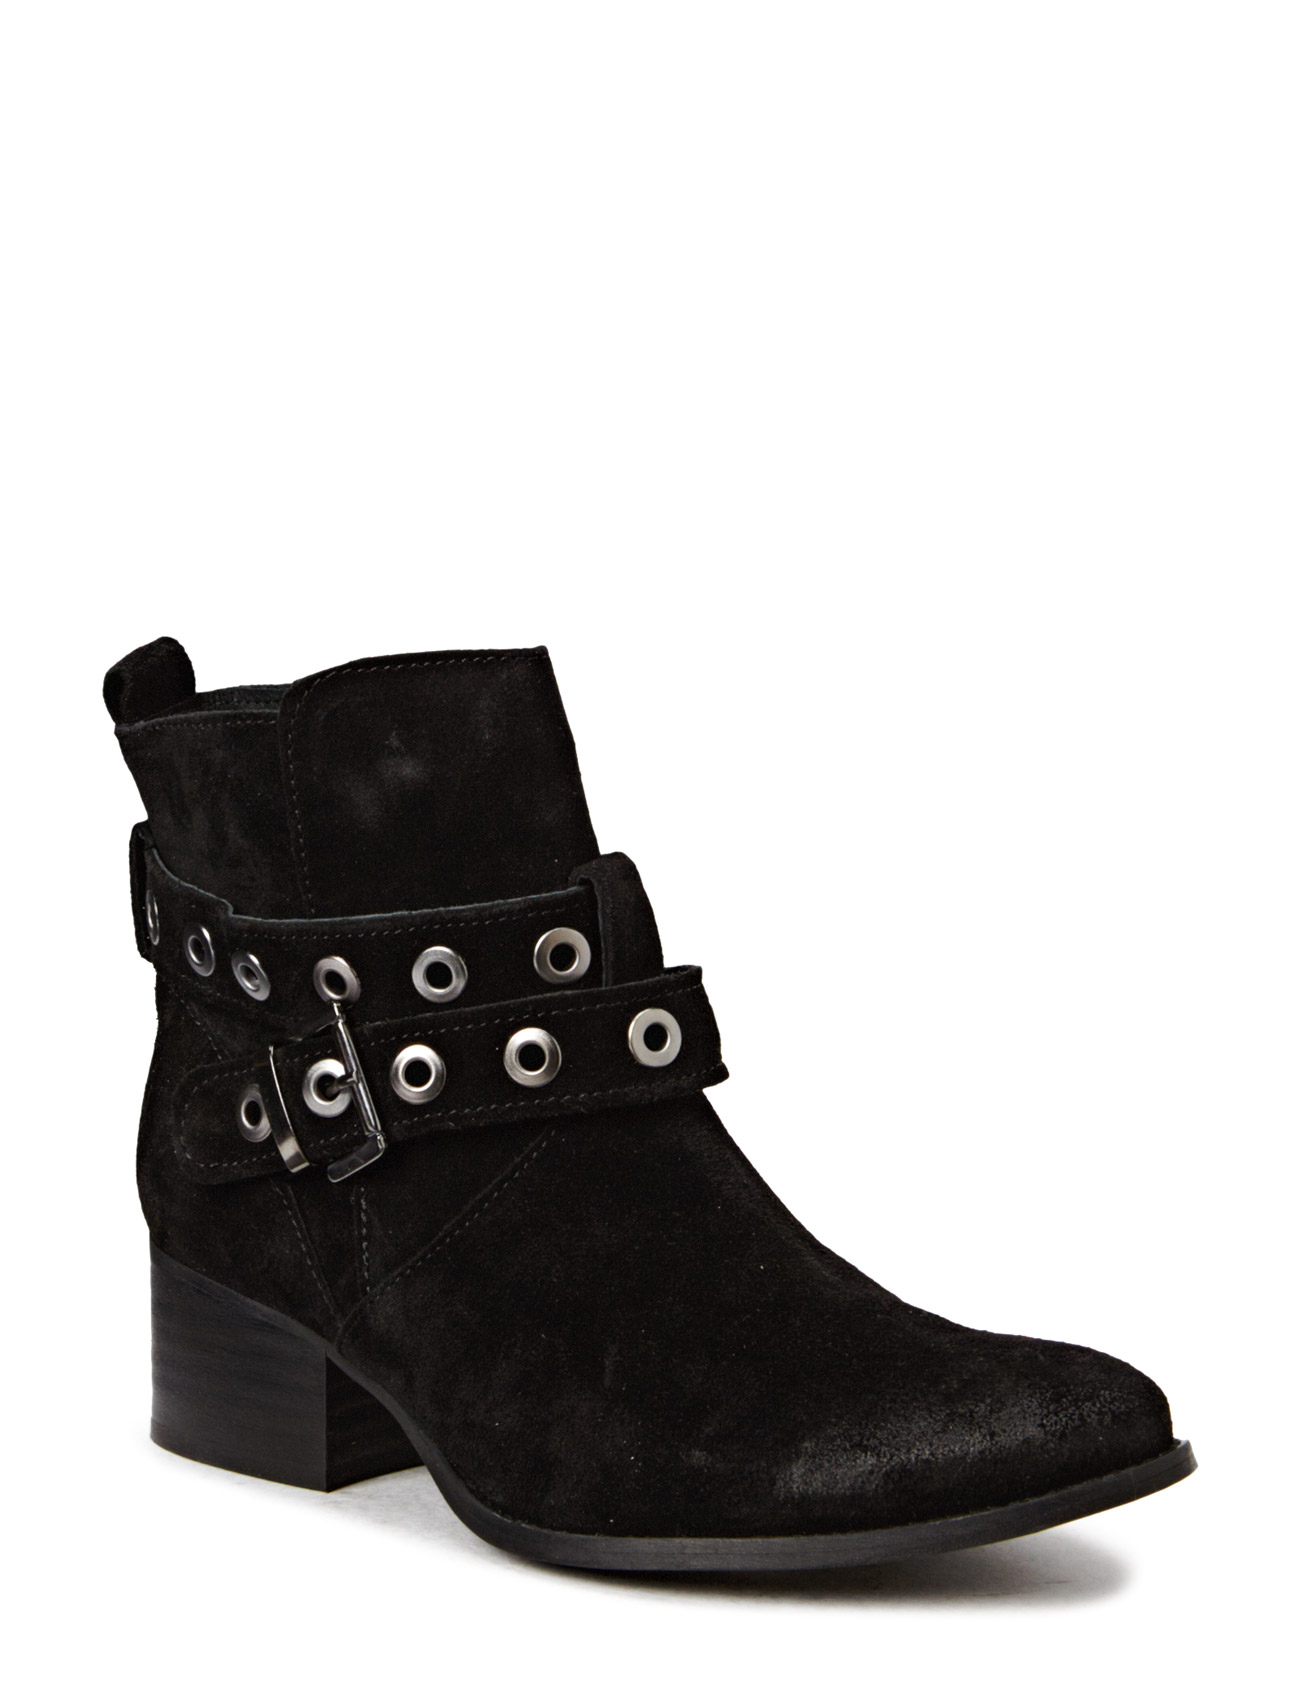 Boot W/Heavy Strap Jja15 Bianco Støvler til Kvinder i Sort